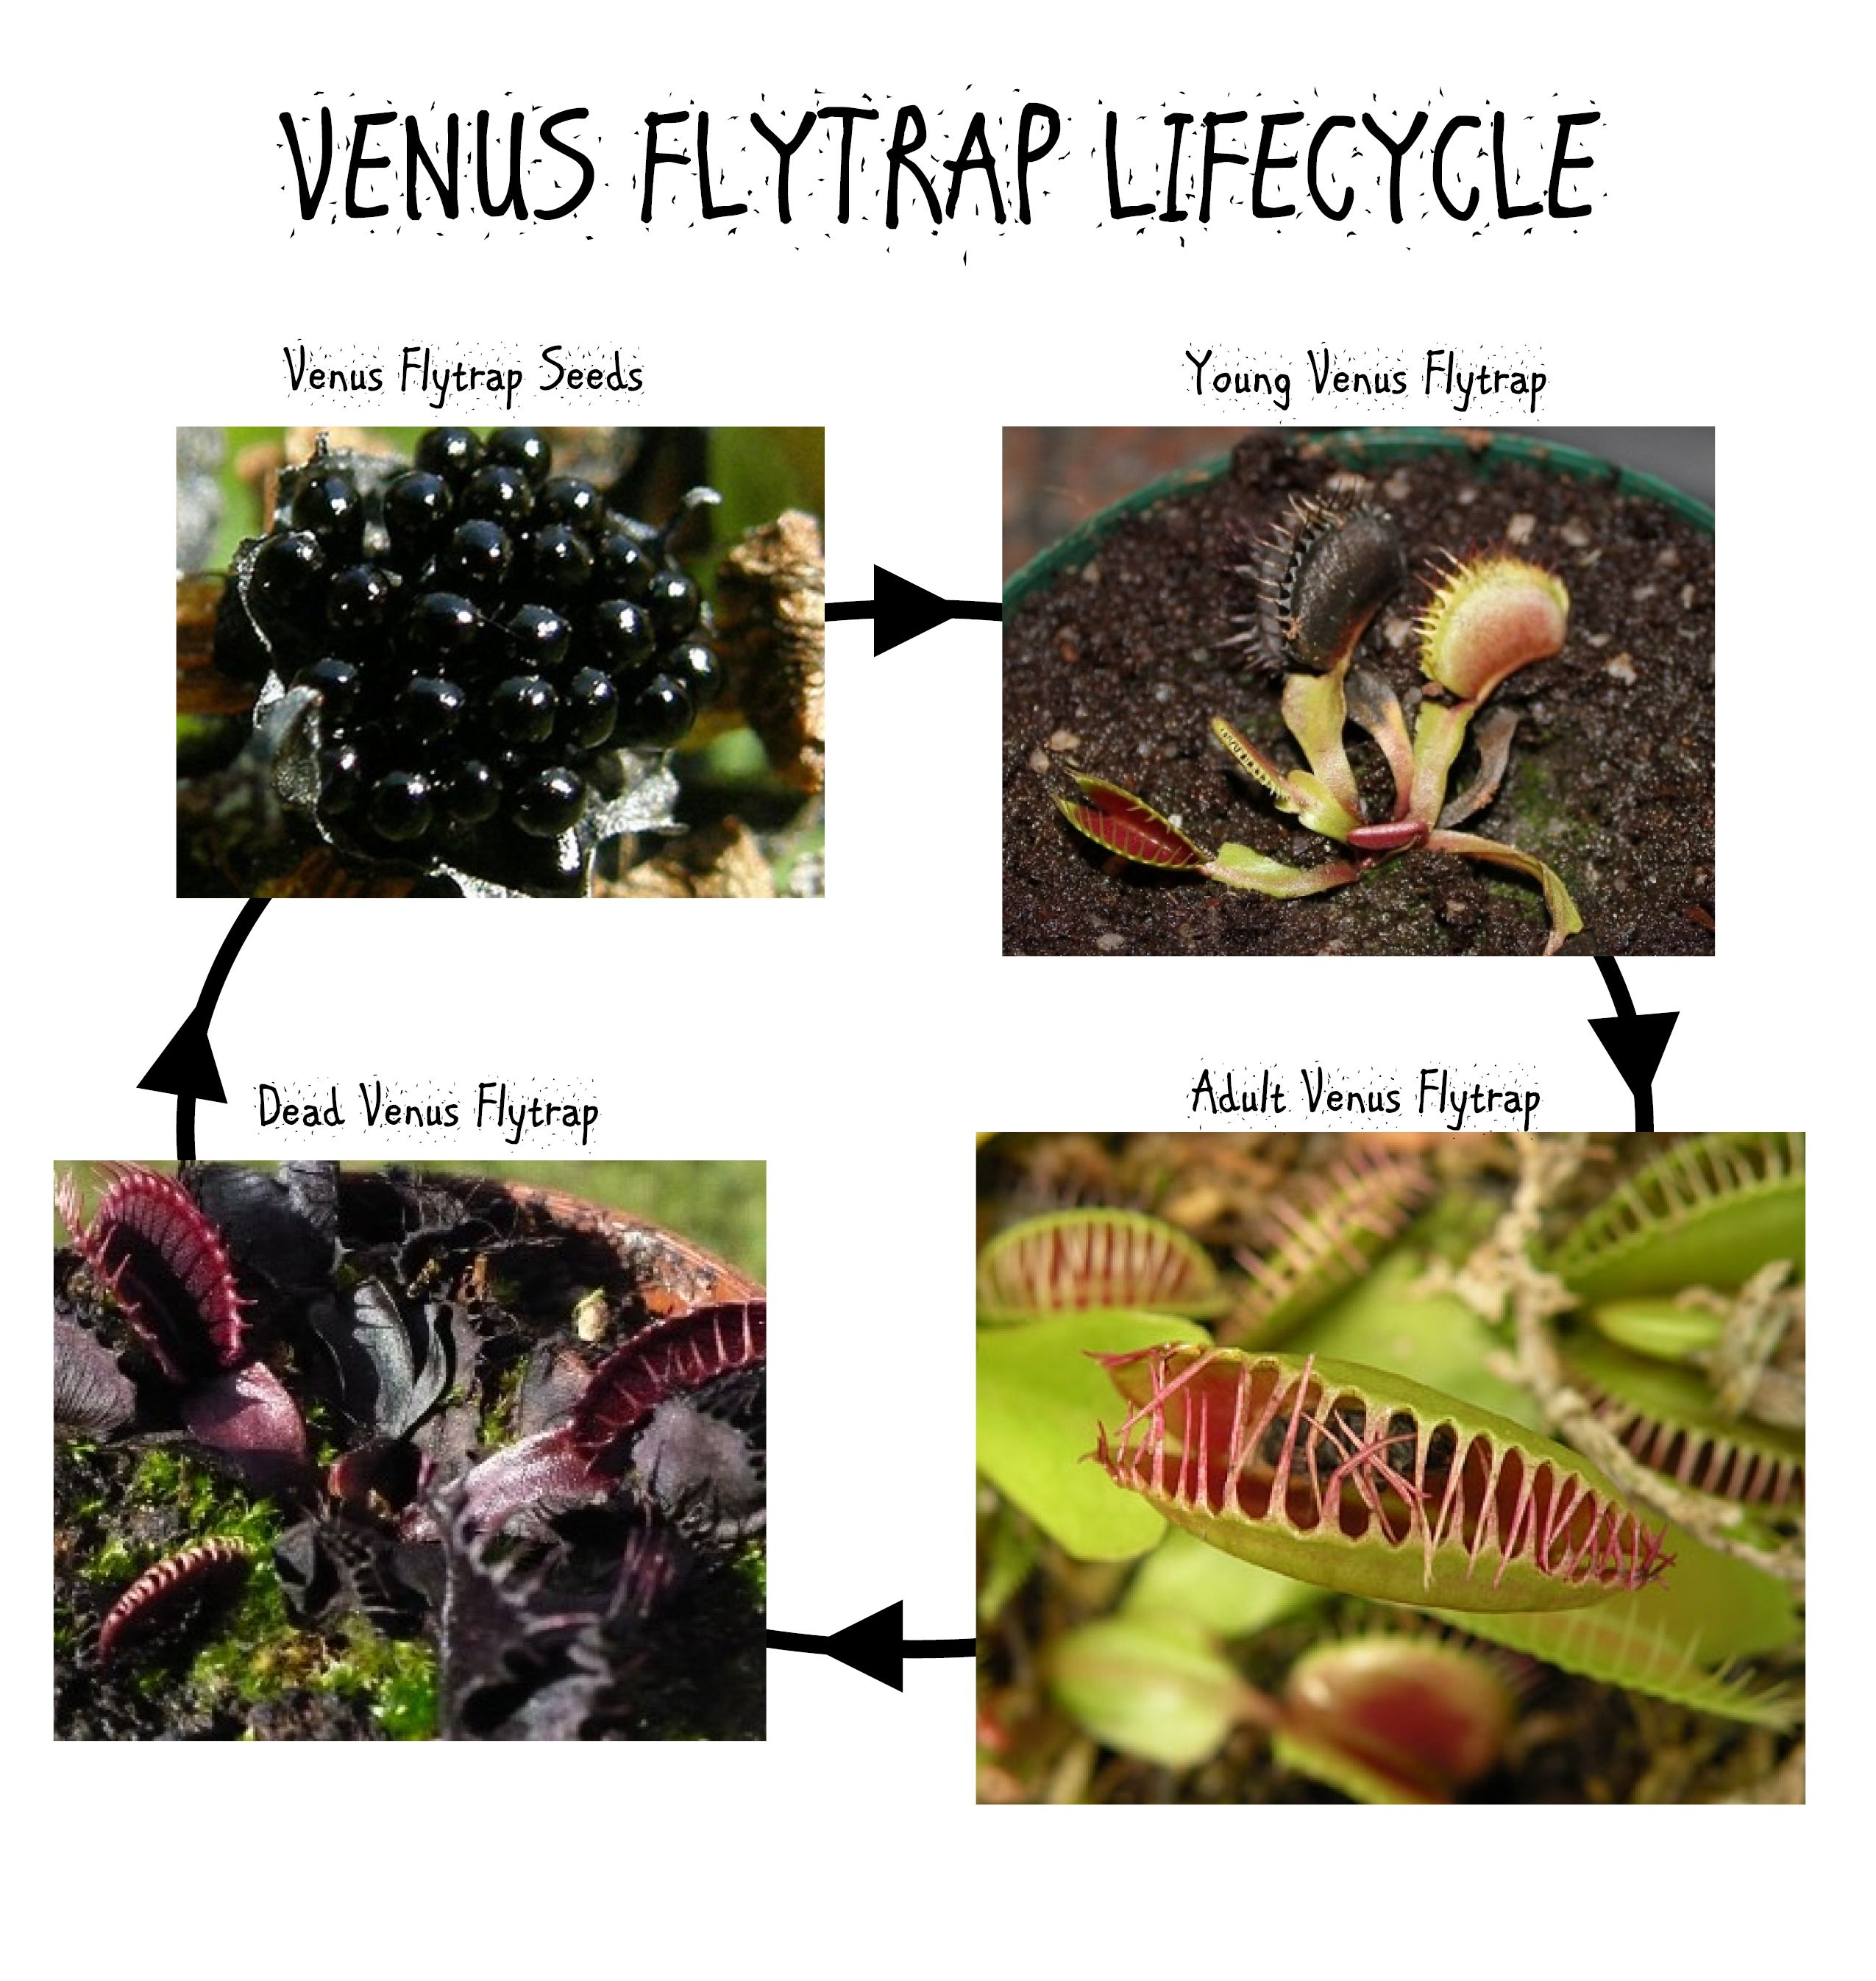 venus flytrap venusflytrap lifecycle k i d s pinterest rh pinterest com Dionaea Muscipula Life Cycle Conifer Life Cycle Diagram